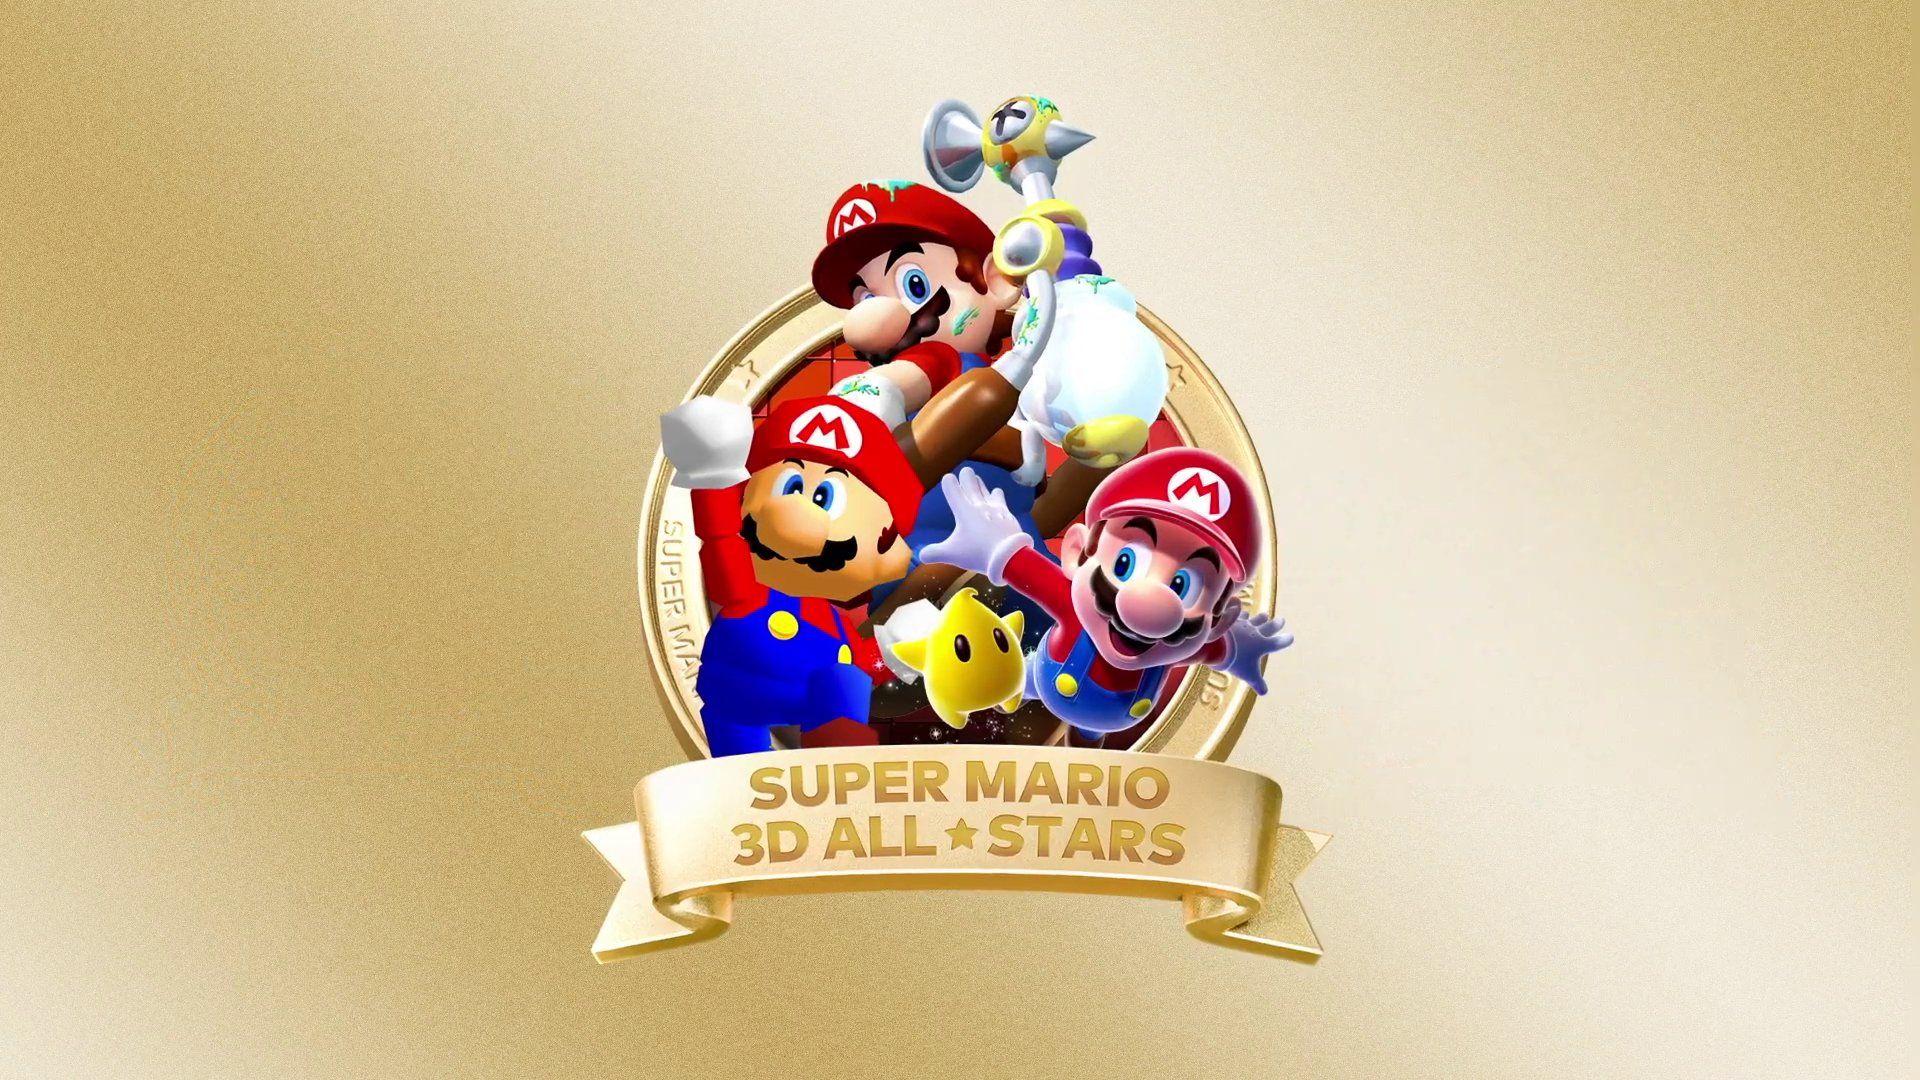 Super Mario 3d All Stars In 2020 Super Mario Super Mario 3d Super Mario All Stars